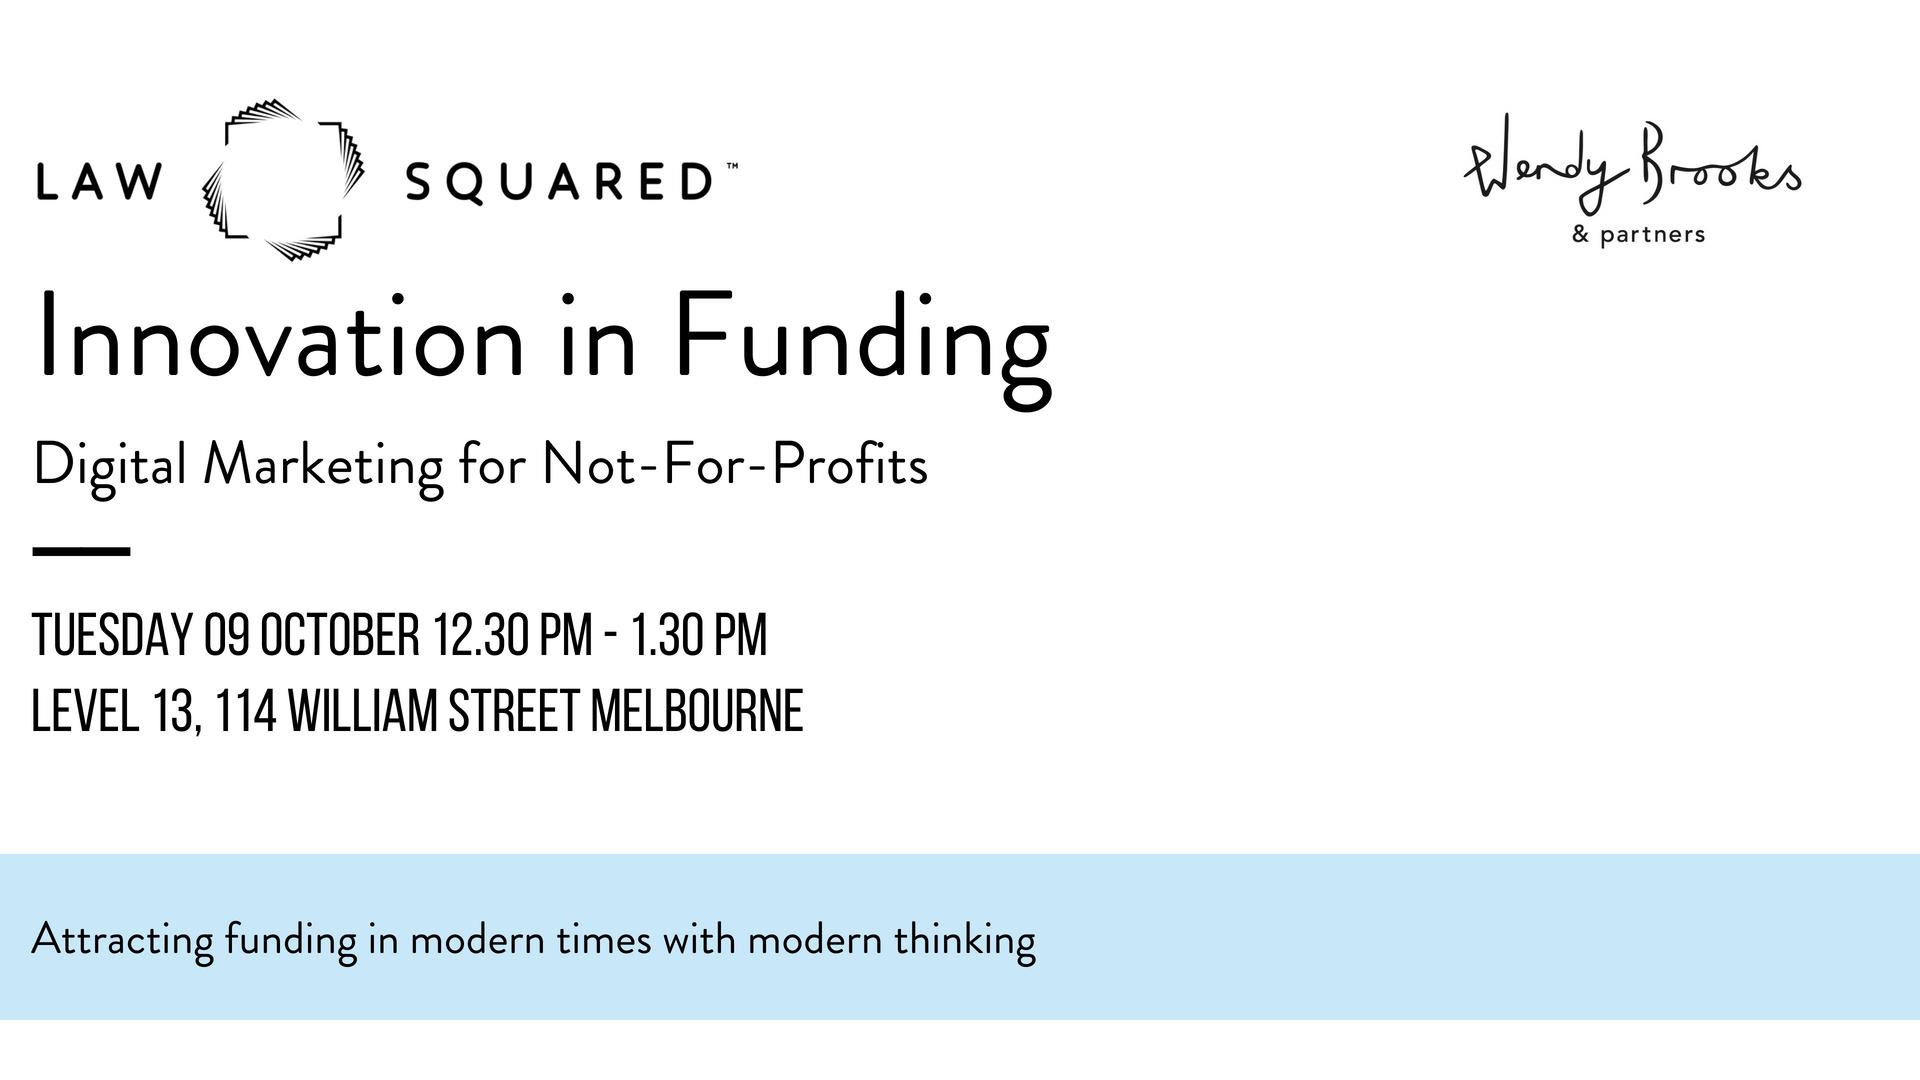 innovationinfundingDMFINAL.png